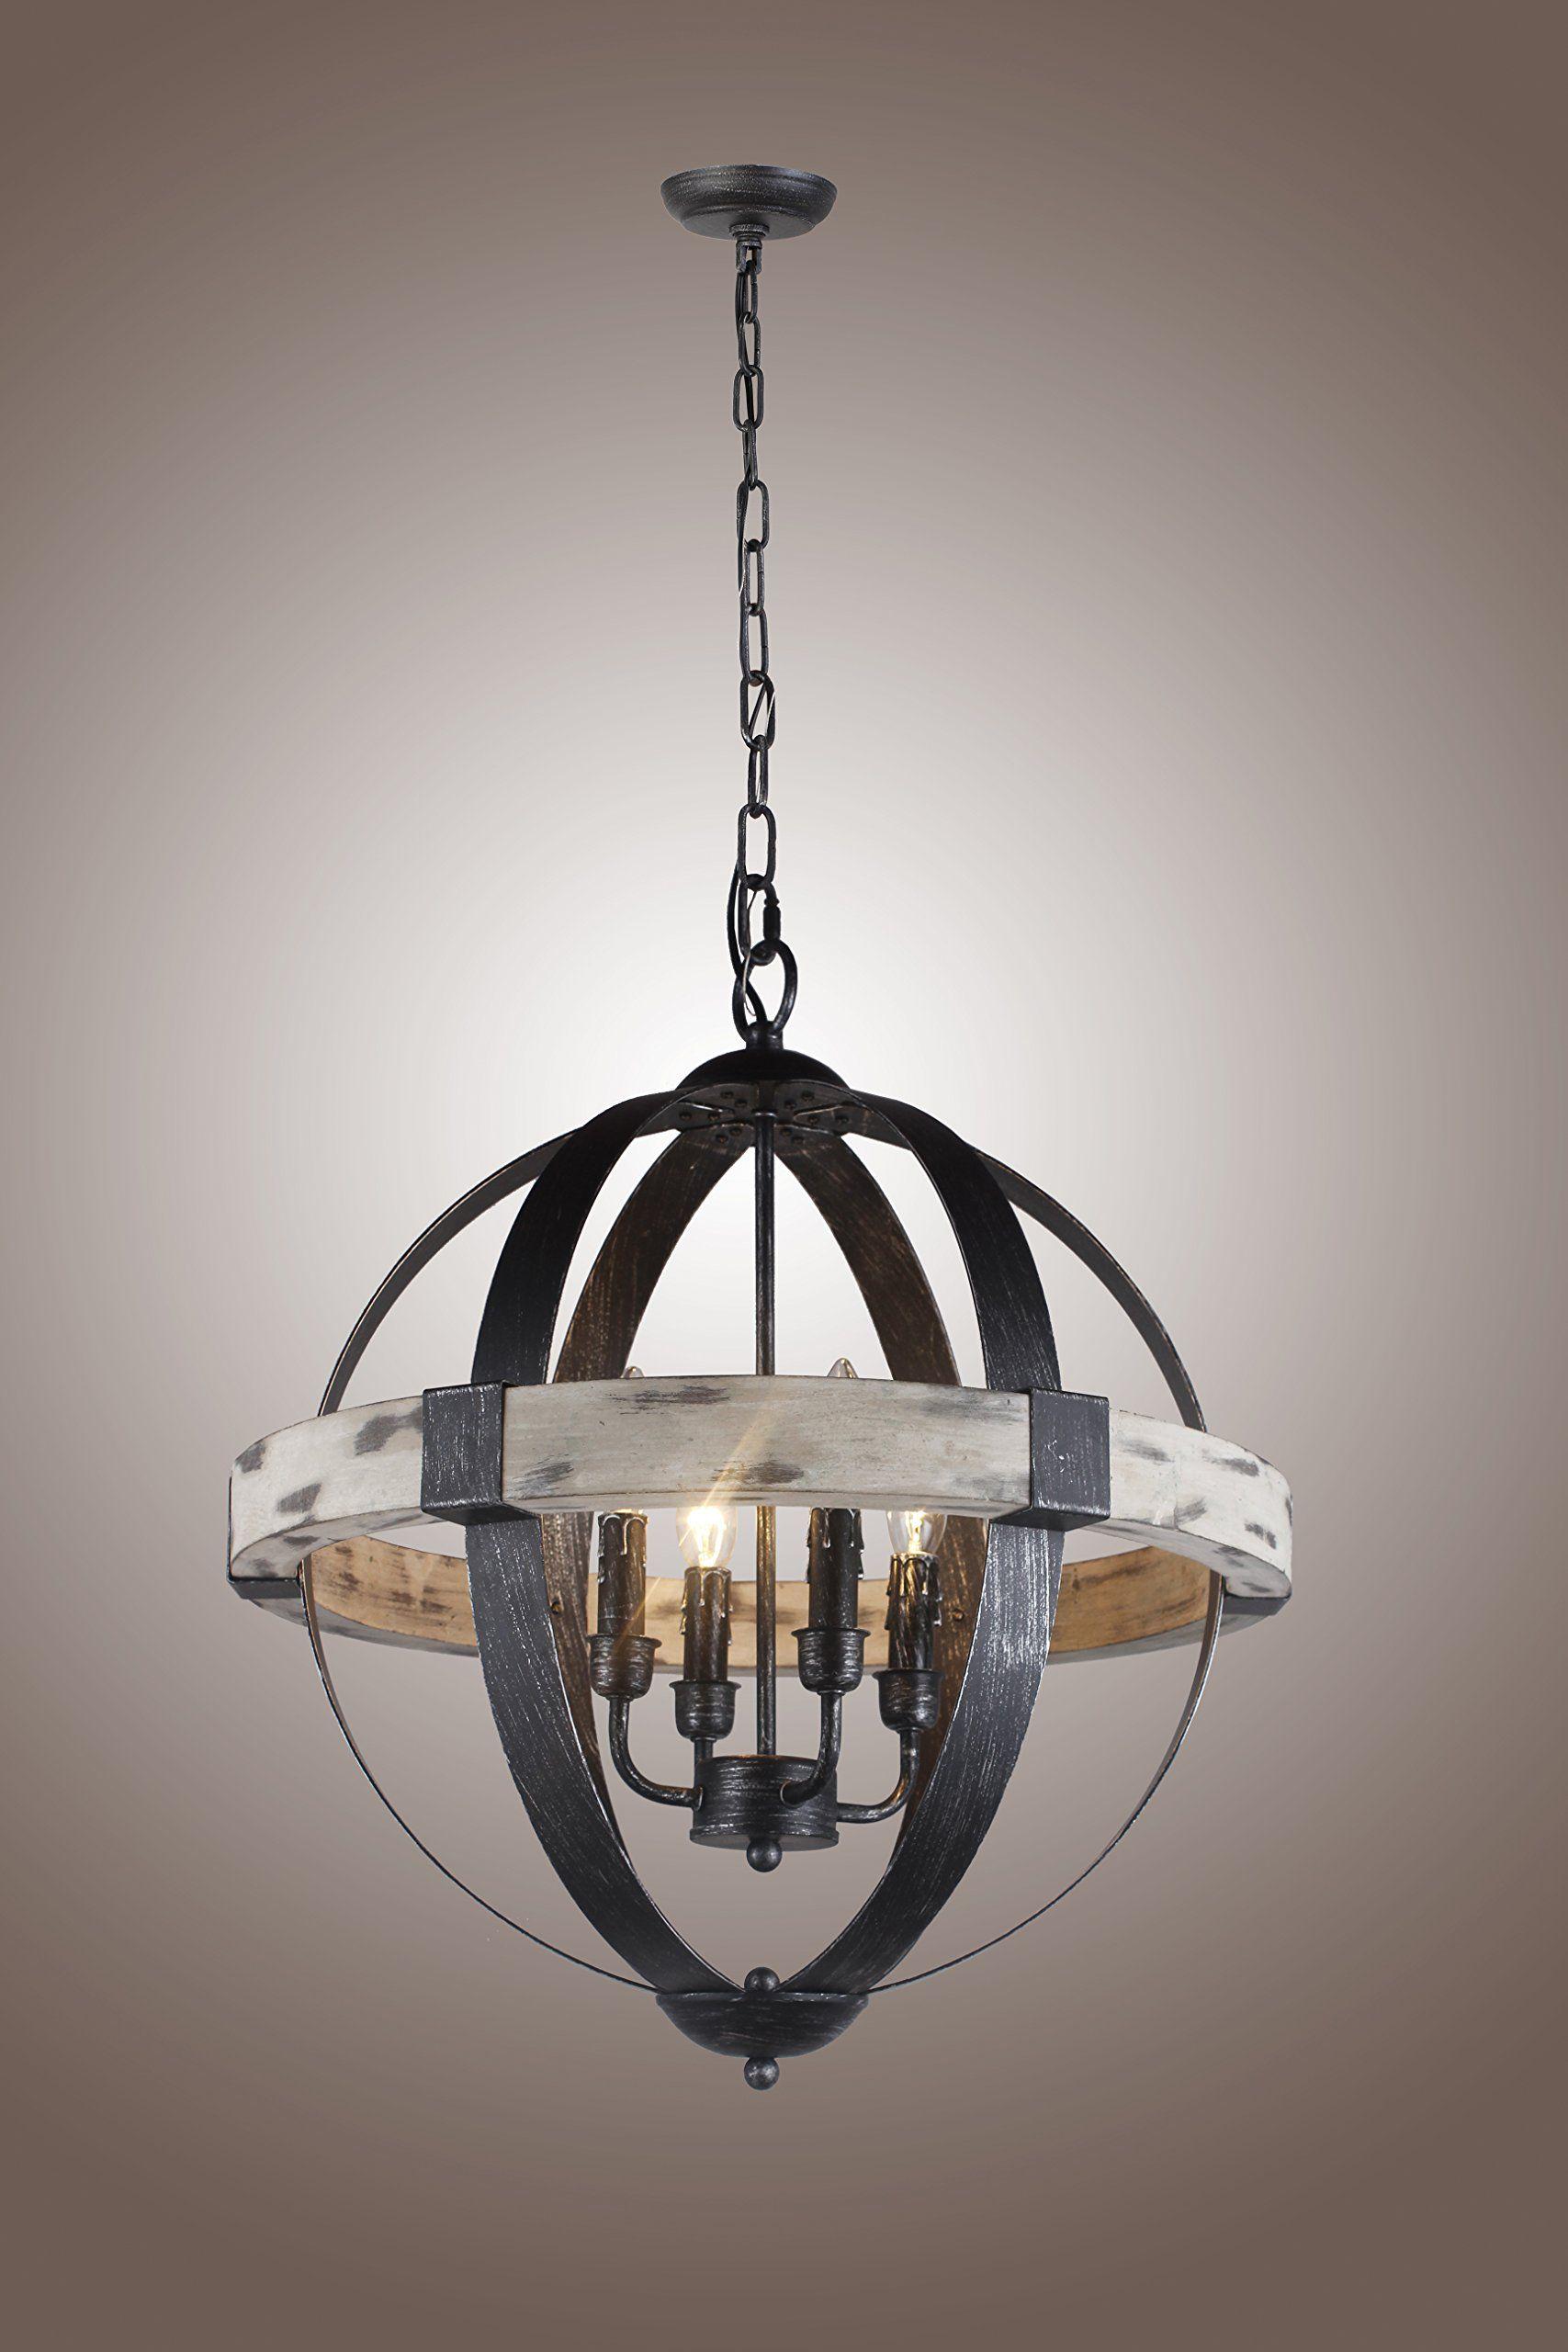 Castello Black Aspen Wrought Iron Globe Wood 4 Light Dia 20 Chandelier